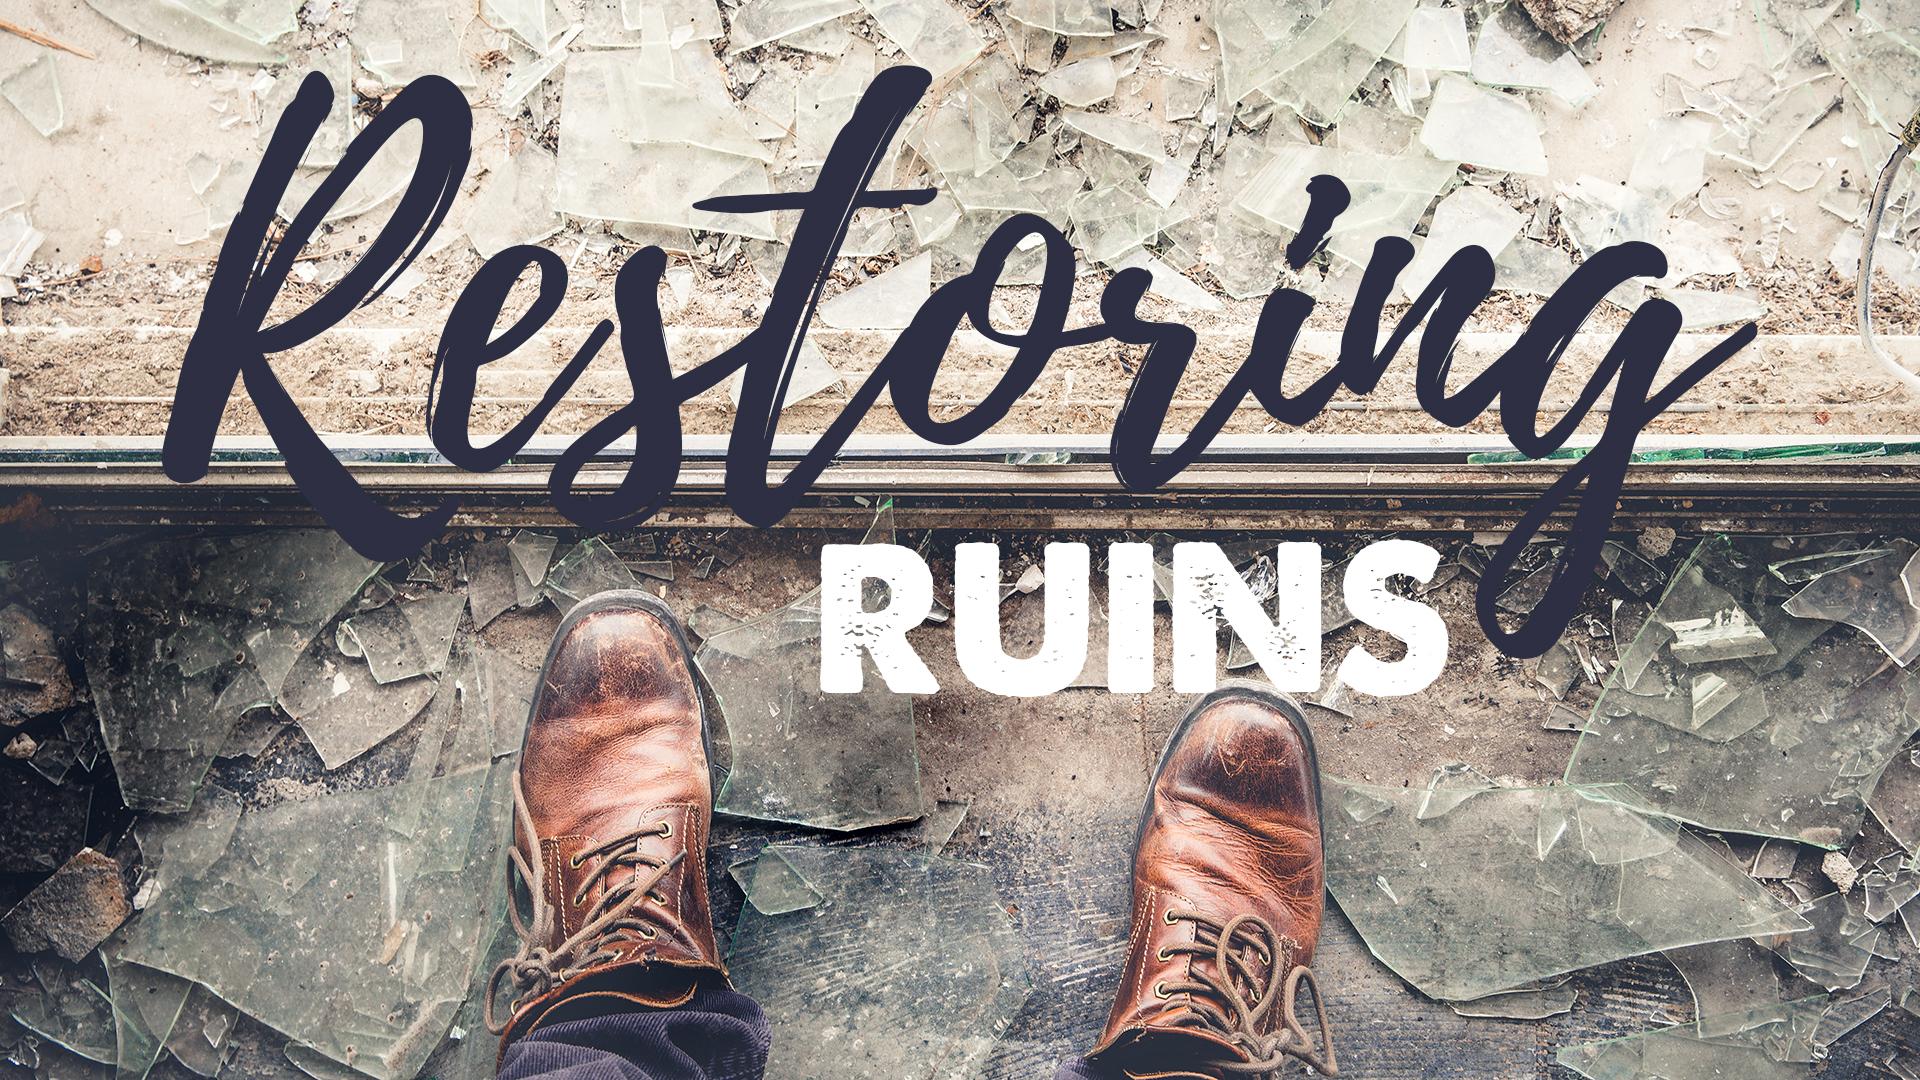 restoring_ruins_1920x1080 (1)